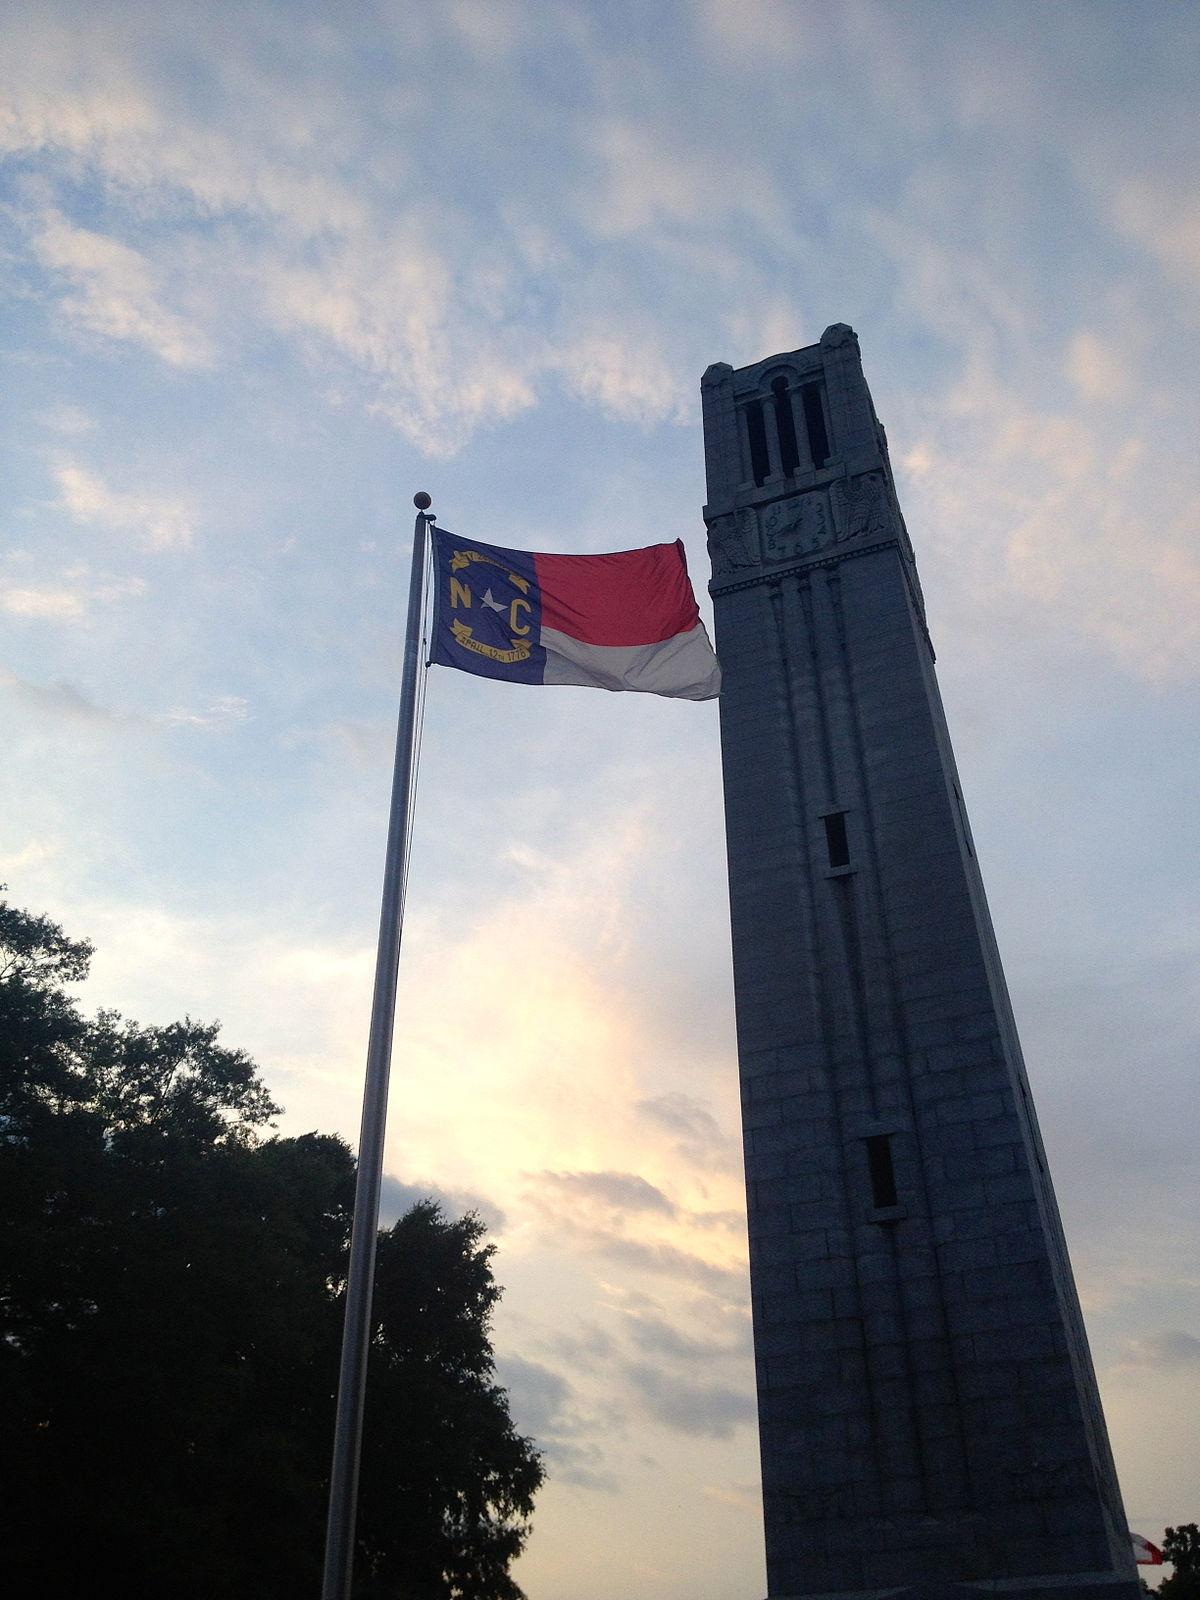 Main Campus of North Carolina State University - Wikipedia